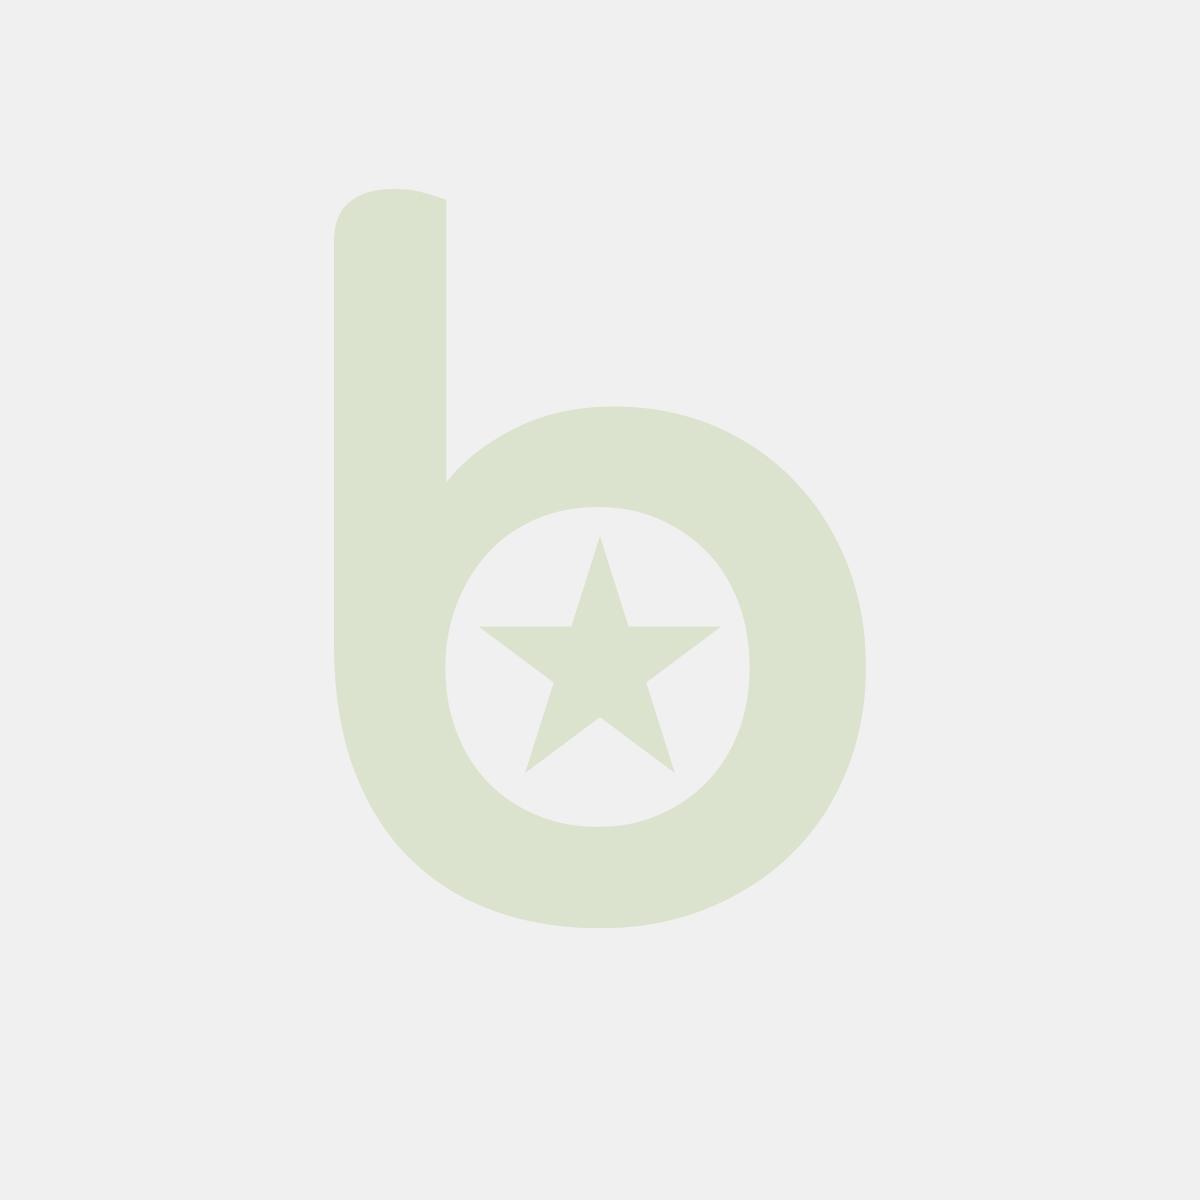 Pióro wieczne SCHNEIDER Inx Sportive, zielone